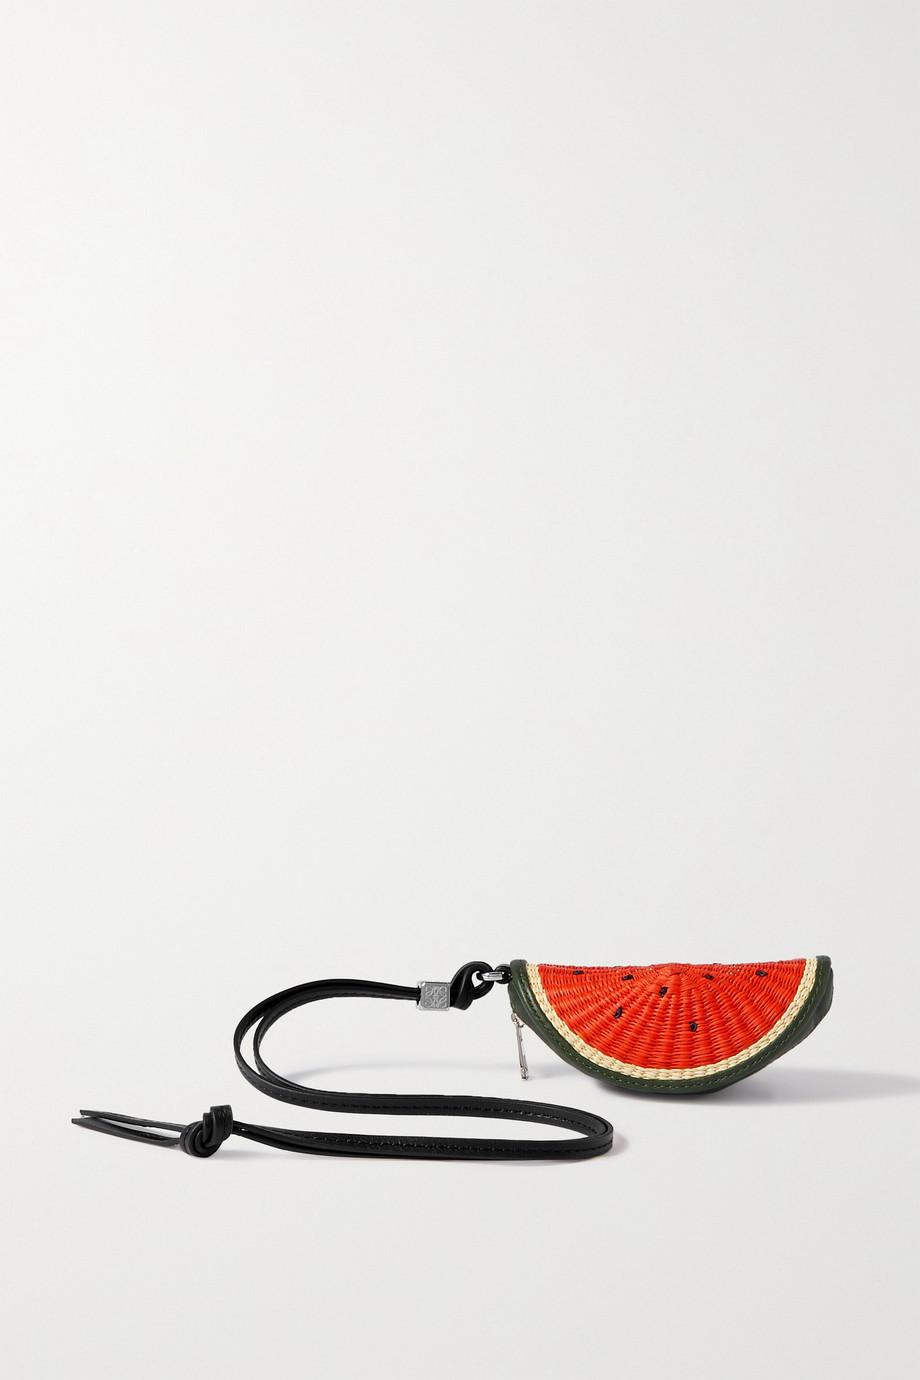 Loewe + Paula's Ibiza leather and raffia coin purse